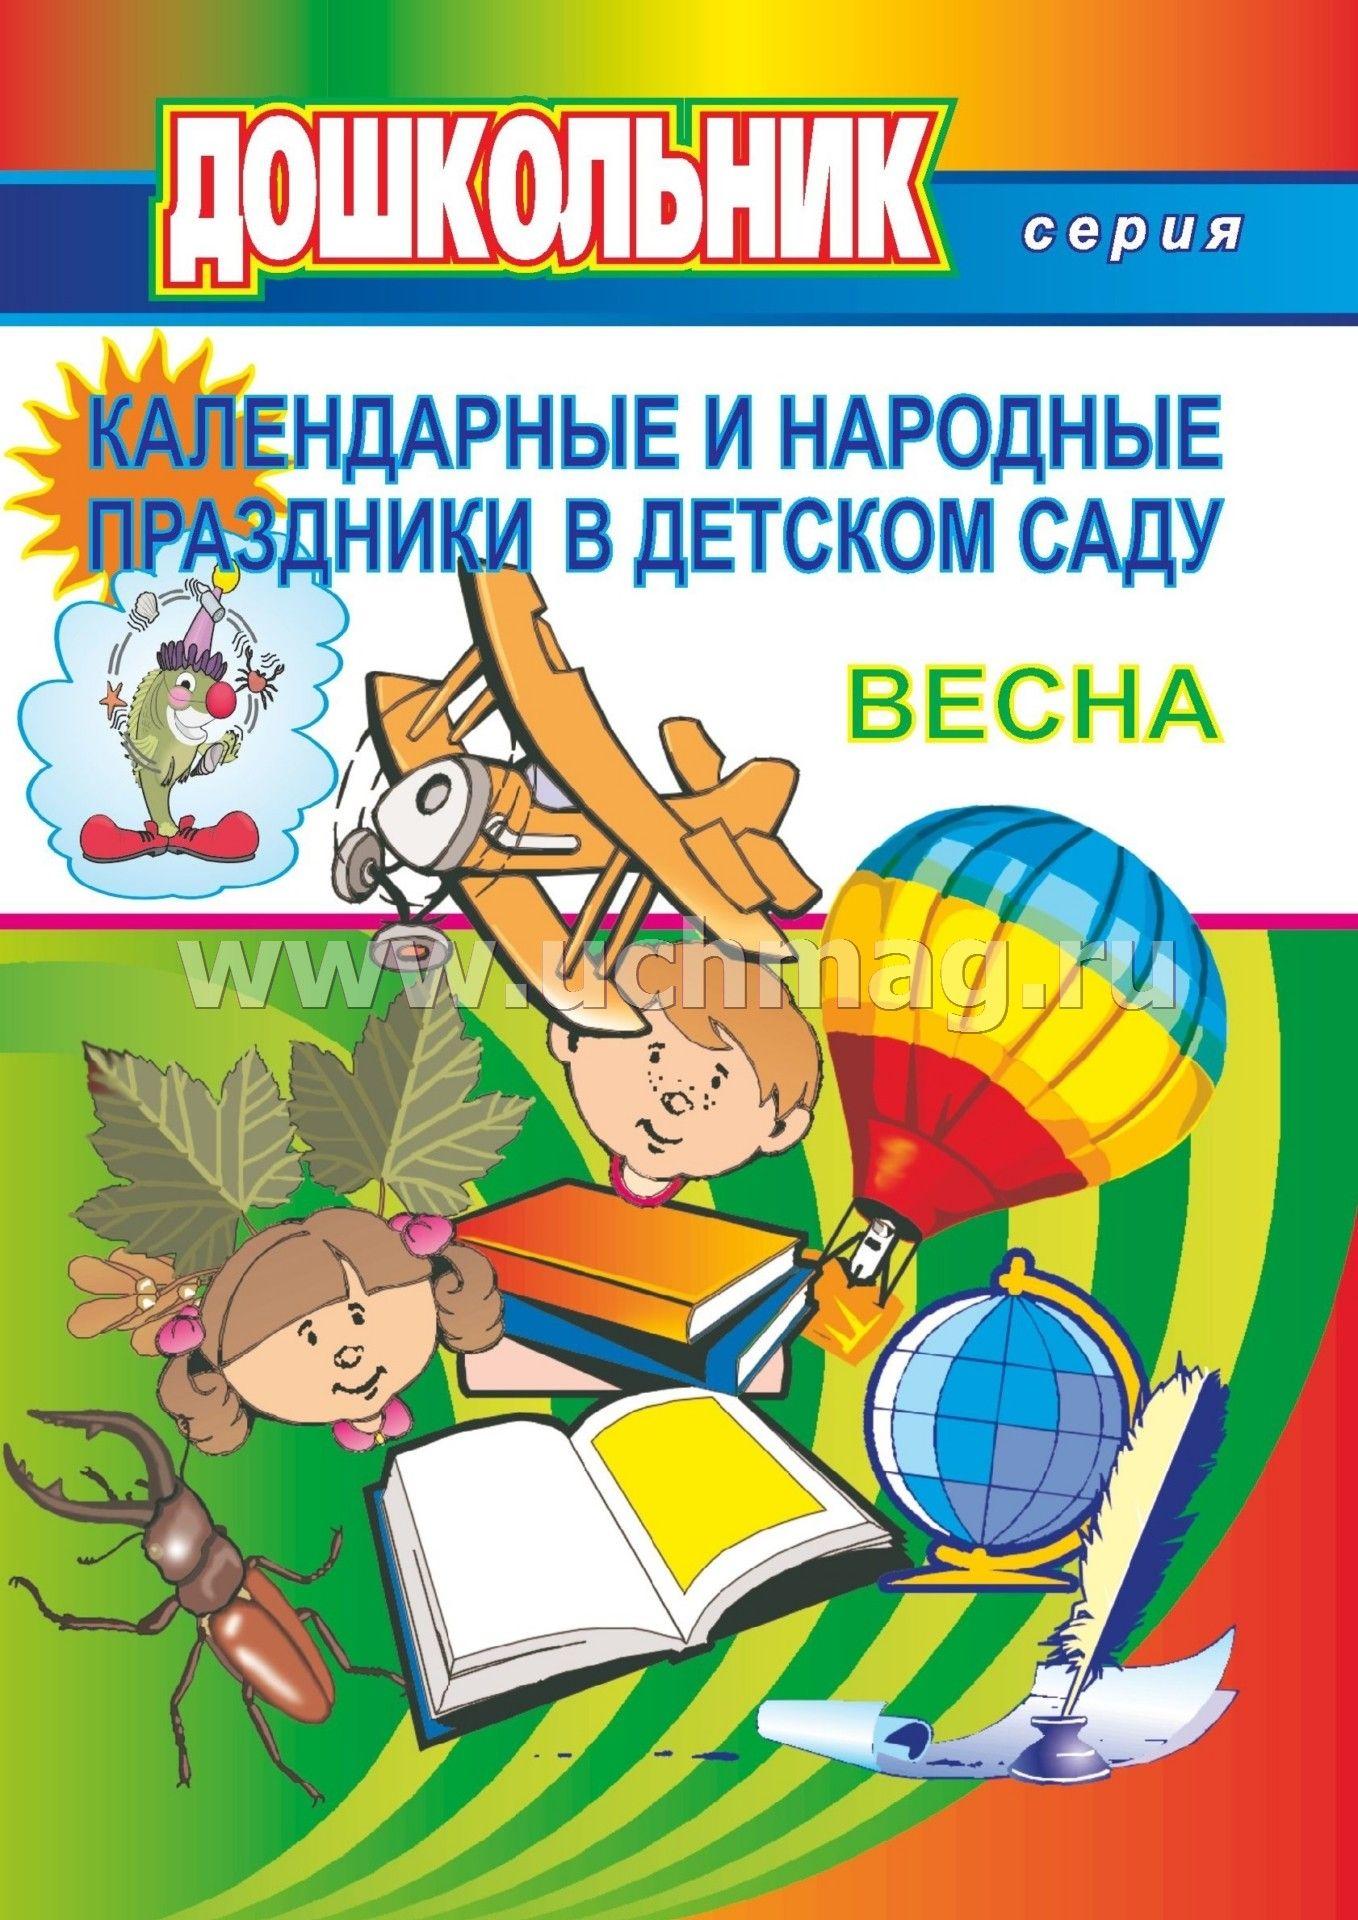 Олимпиада спортивные праздники сценарии